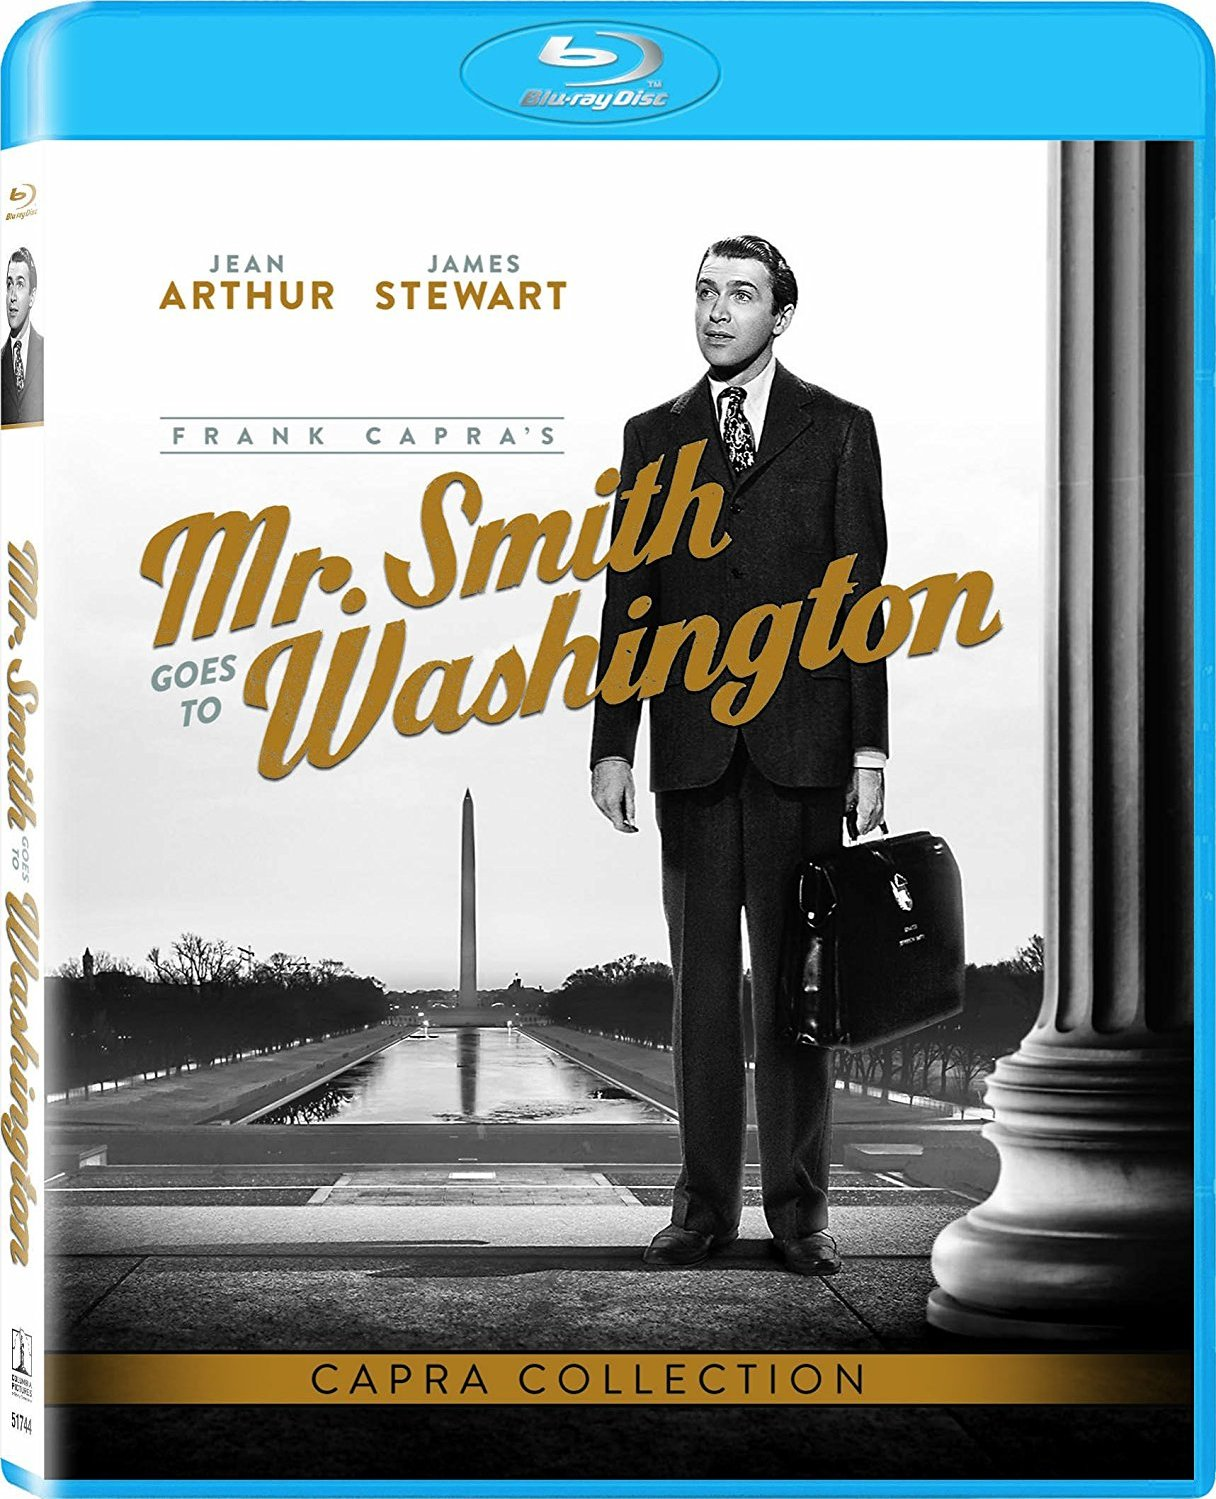 Mr. Smith Goes to Washington (1939) Blu-ray